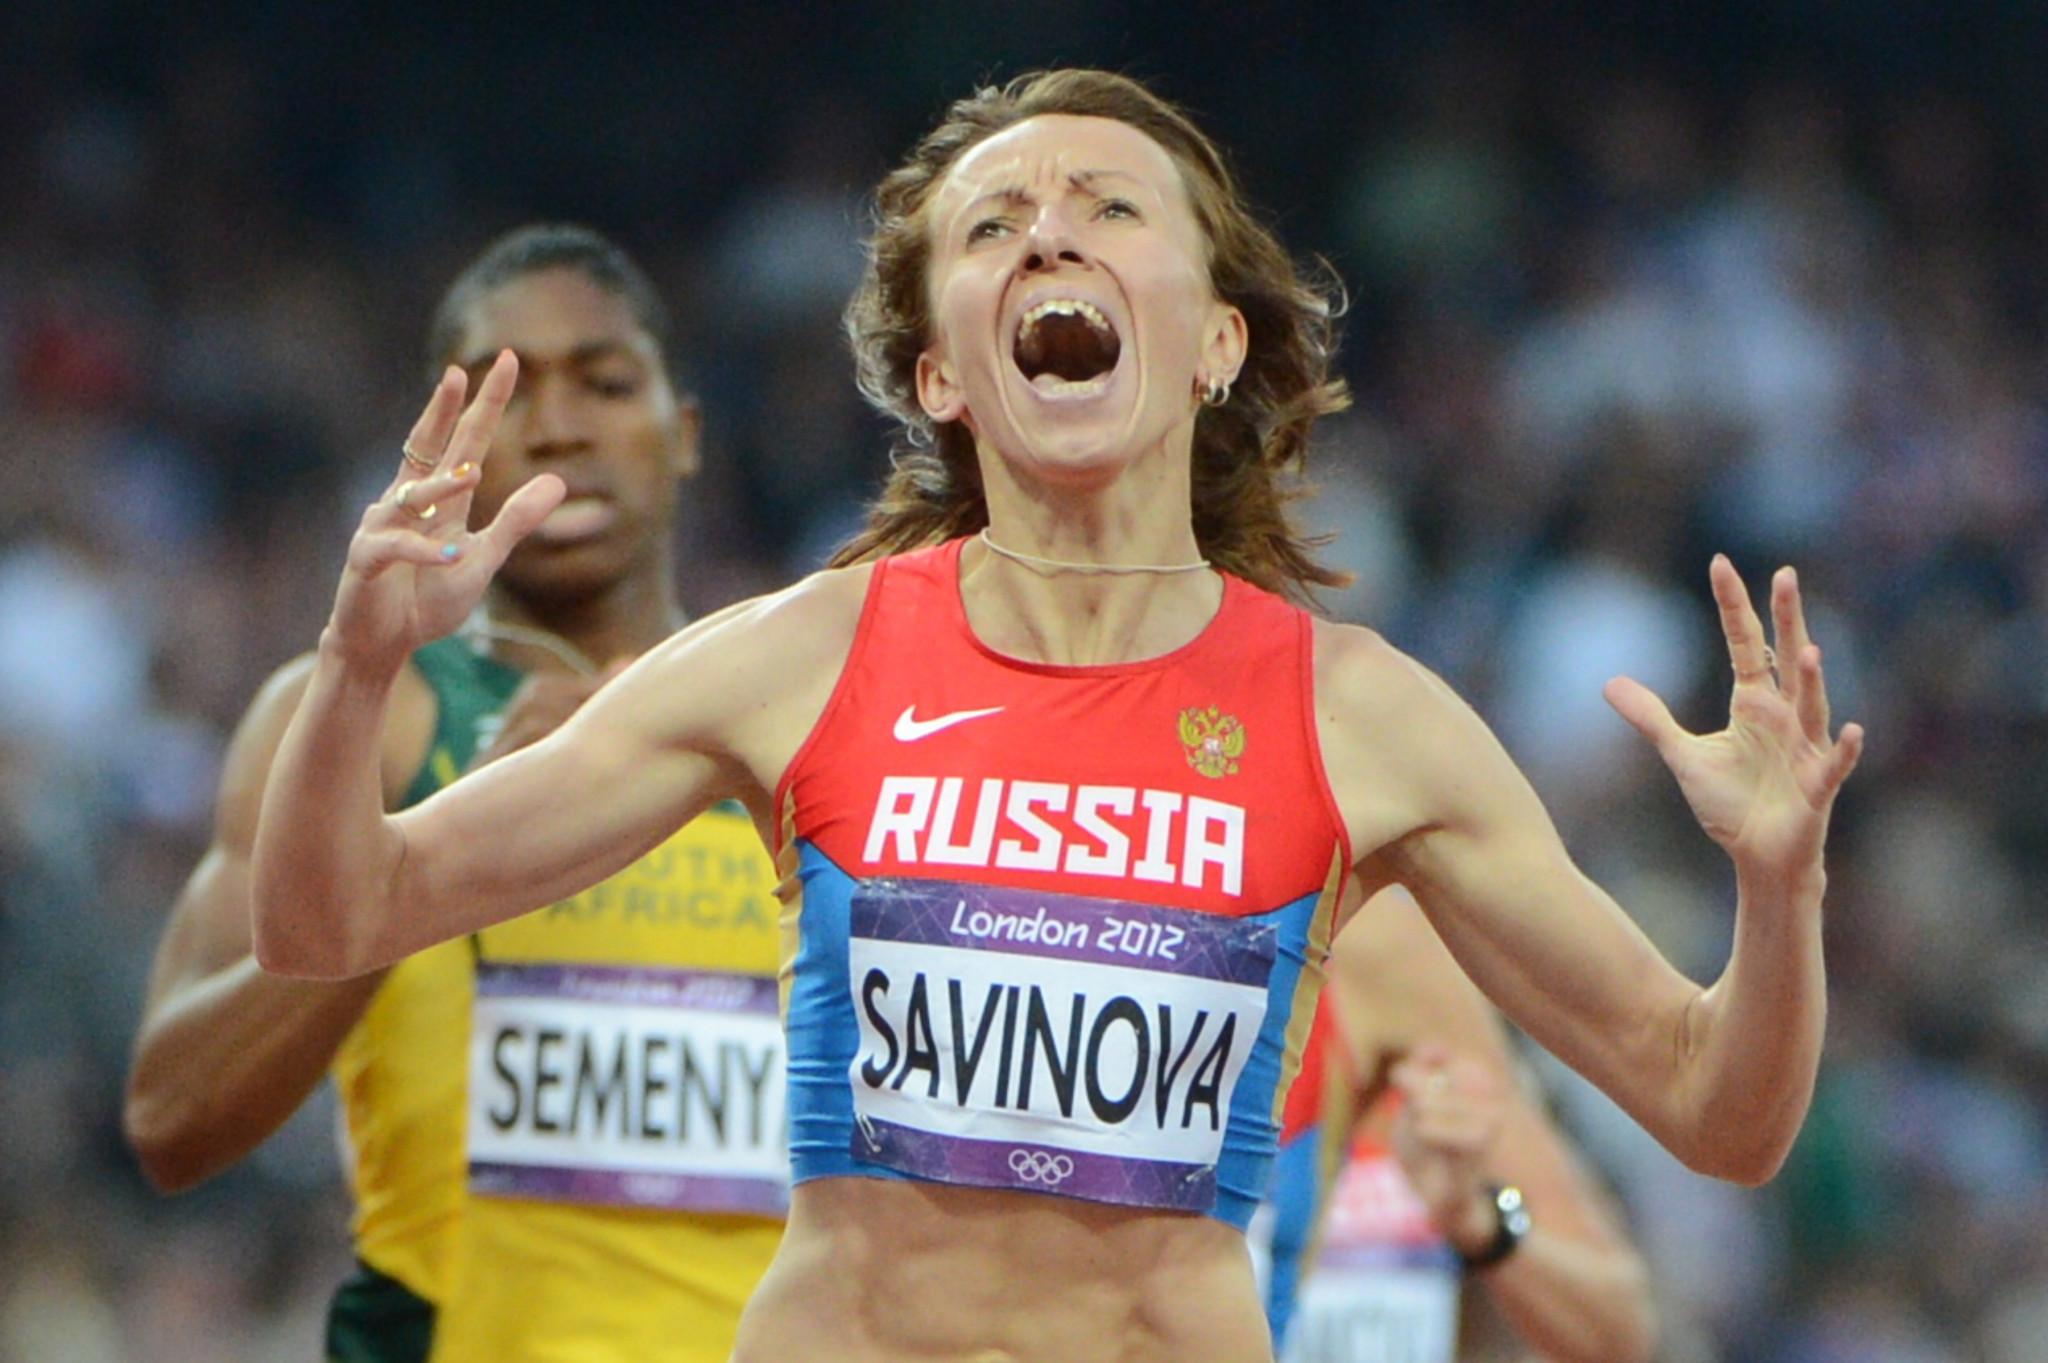 Russia's Mariya Savinova beat South Africa's Caster Semenya to the Olympic 800 metres at London 2012 ©Getty Images